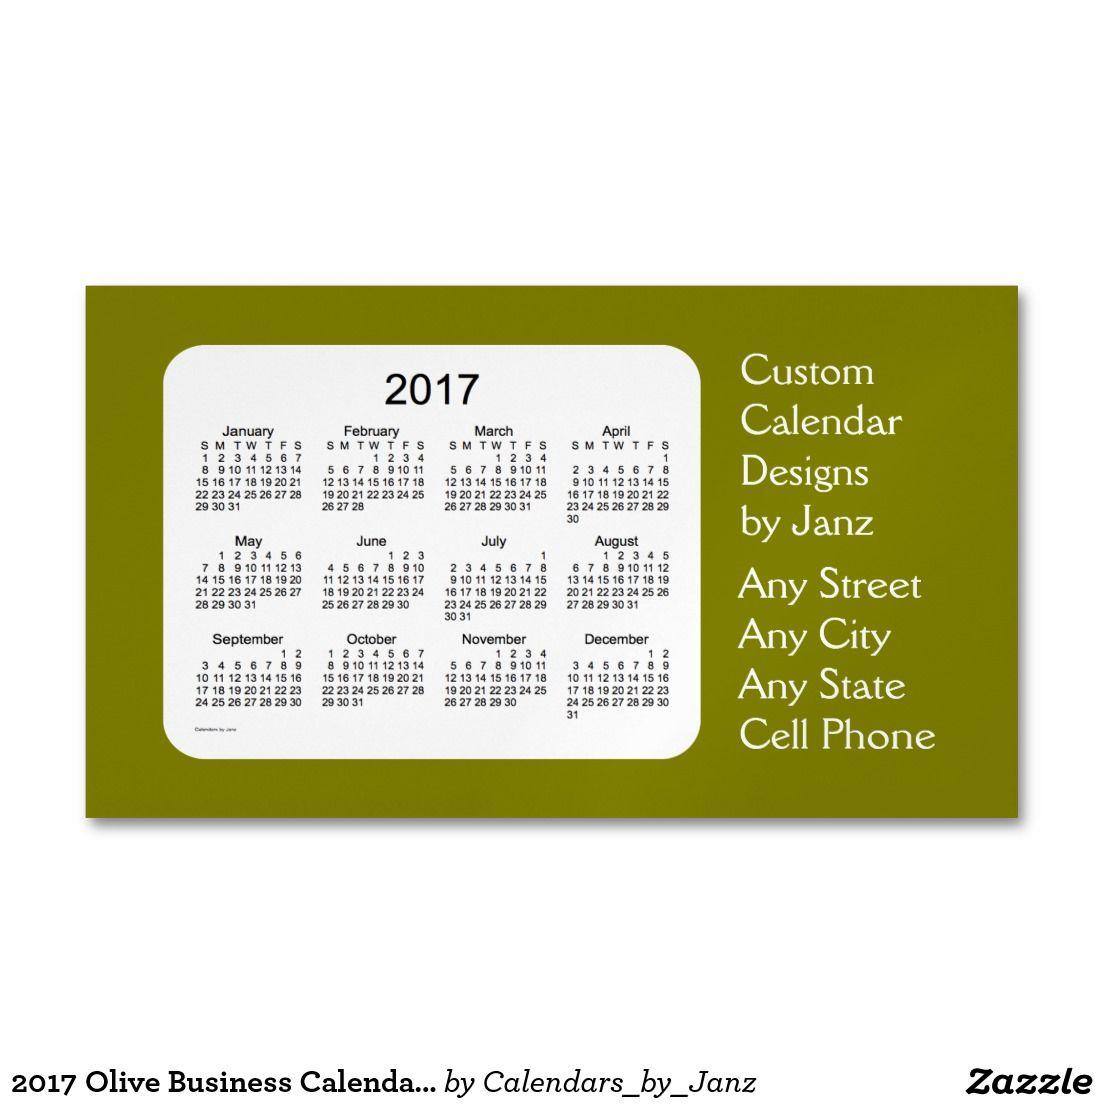 2017 olive business calendar by janz magnet magnetic business card 2017 turquoise business calendar by janz magnet magnetic business cards pack of colourmoves Images